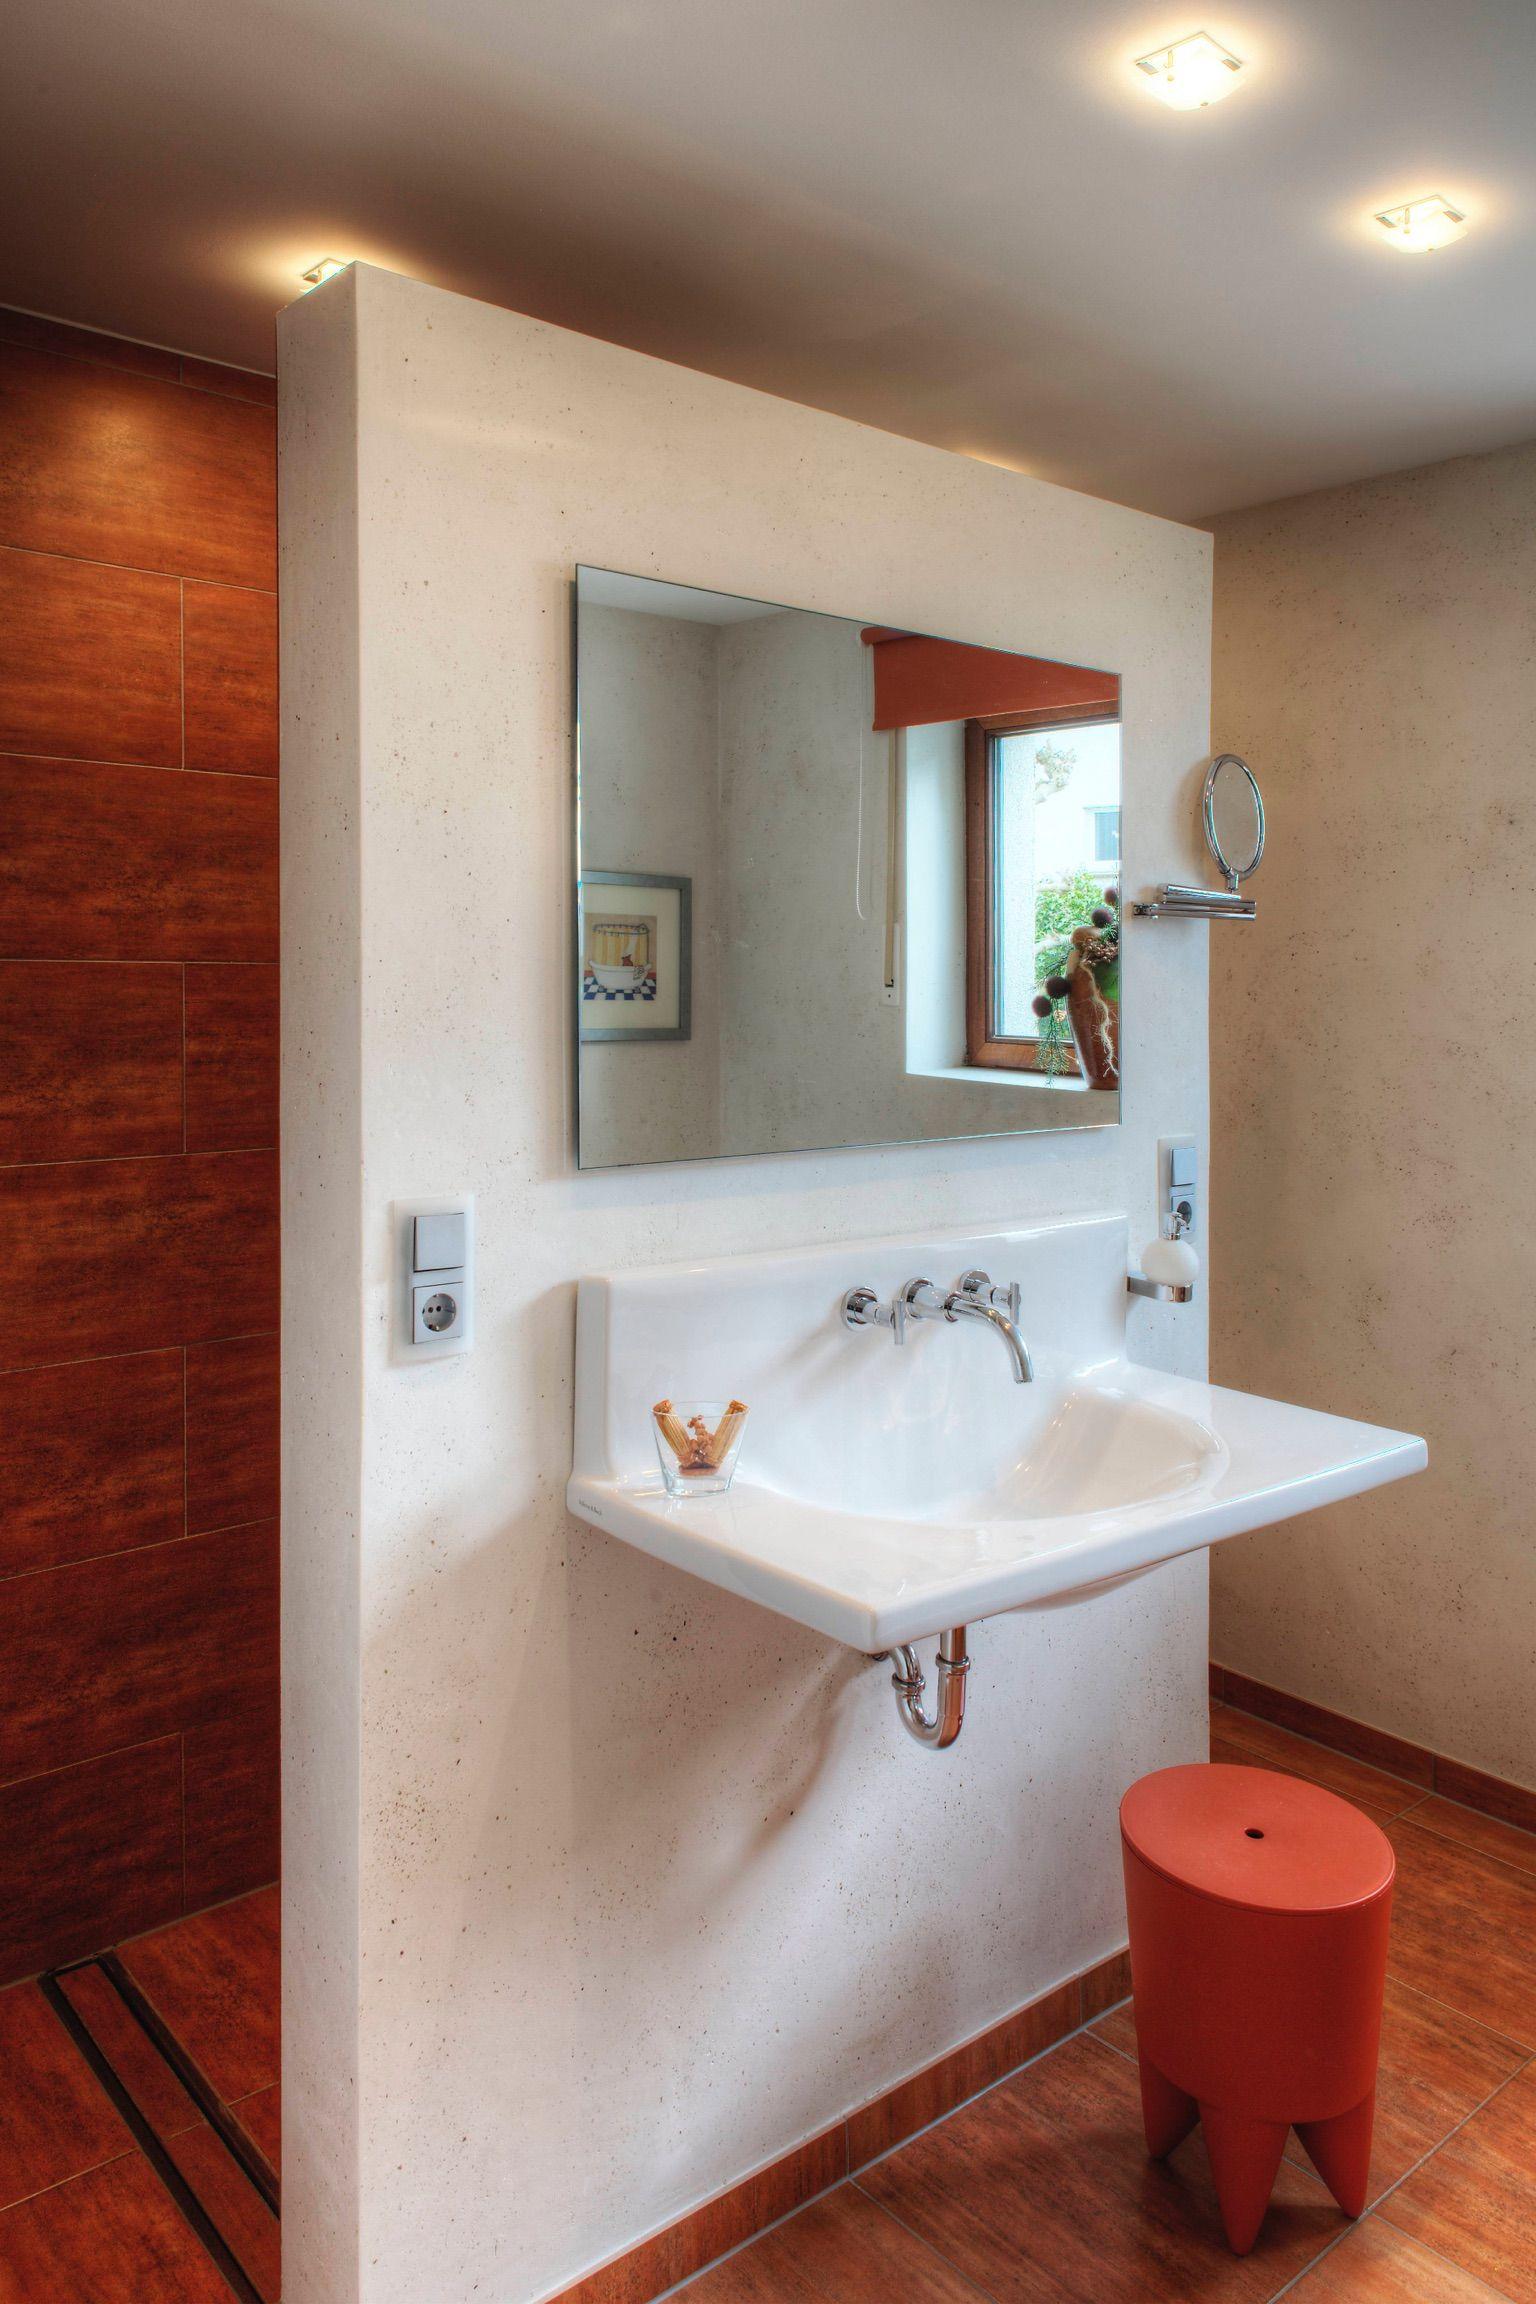 Badezimmer Wandgestaltung Mittels Terra Stone Effektputz Mit Glimmer Schone Badezimmer Badezimmer Wandgestaltung